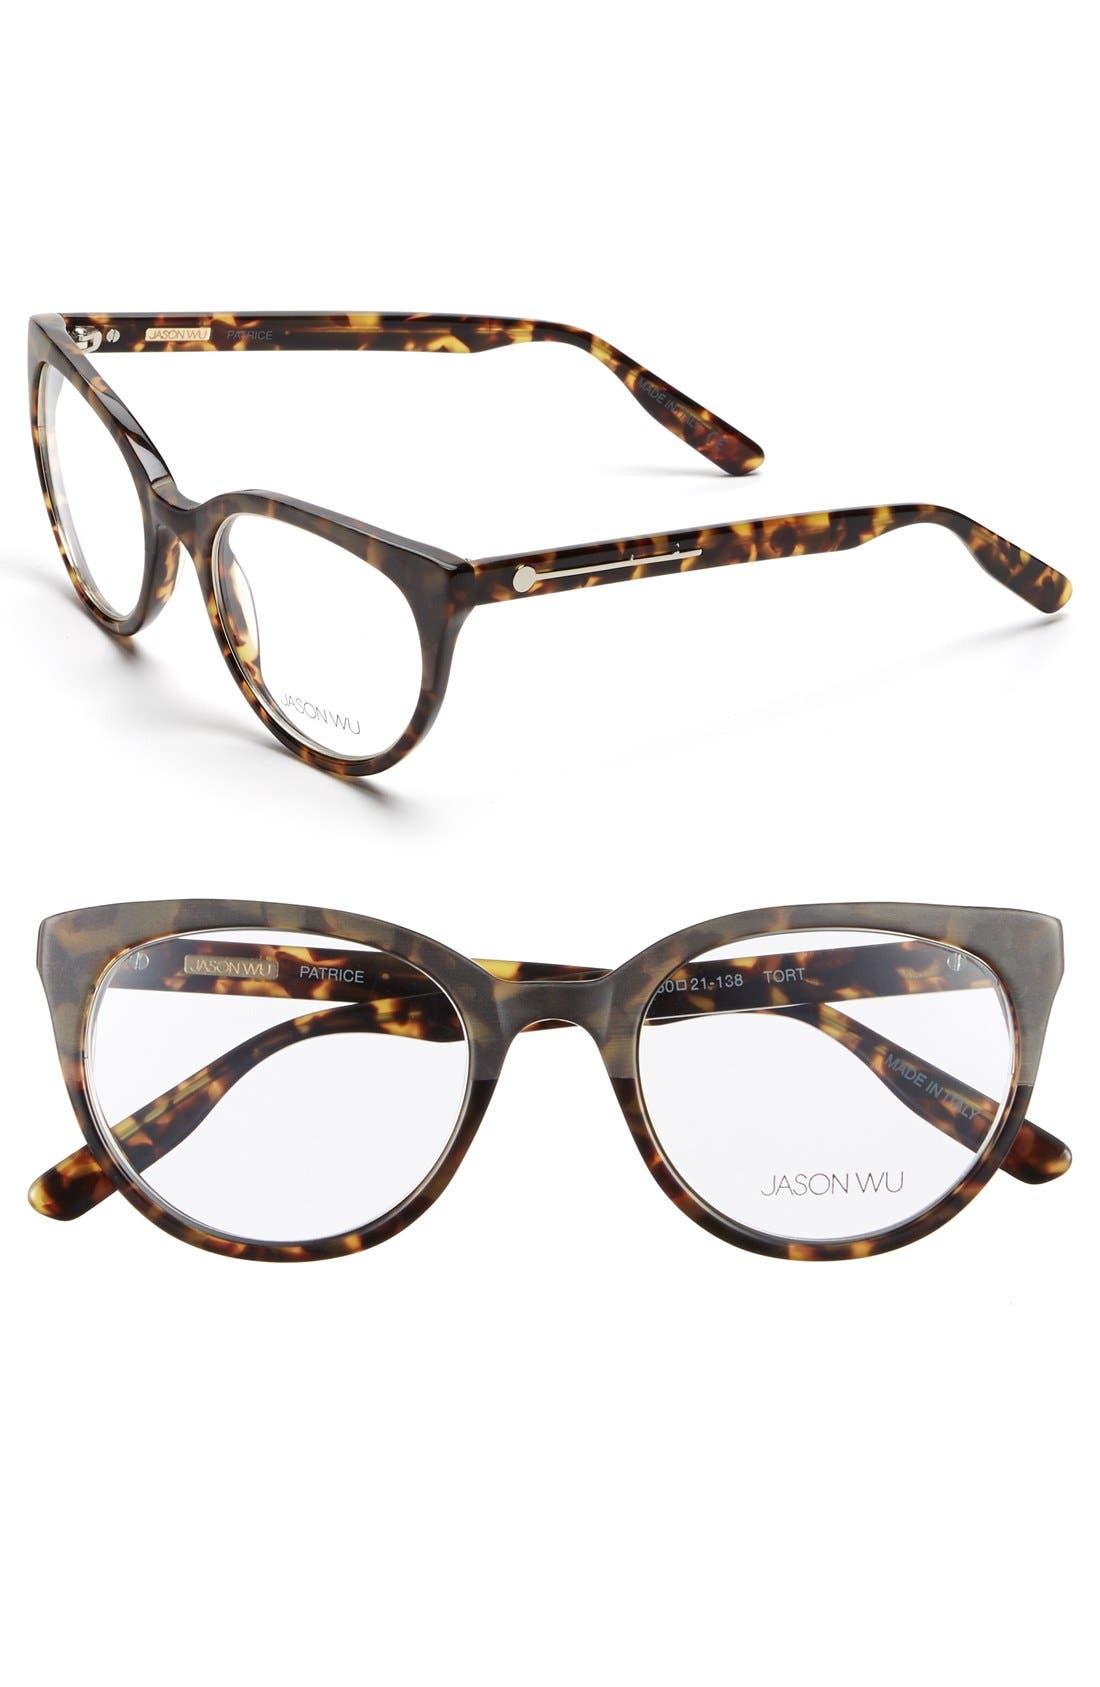 Alternate Image 1 Selected - Jason Wu 'Patrice' 50mm Optical Glasses